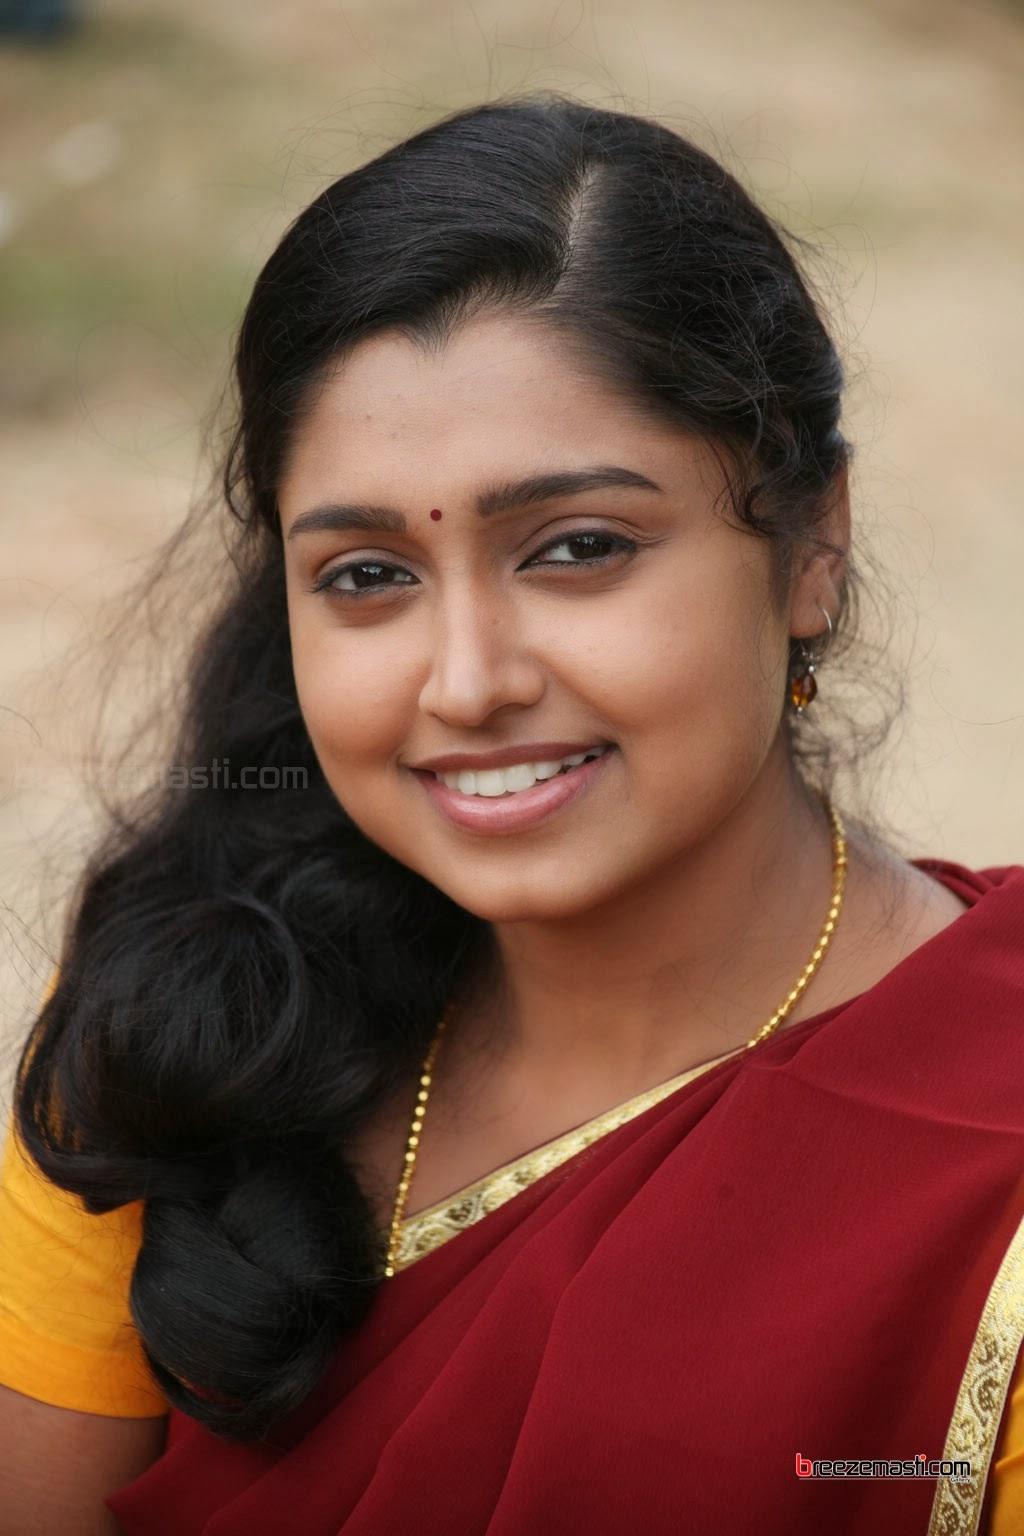 facebook girls tamil nadu facebook girls photo collection